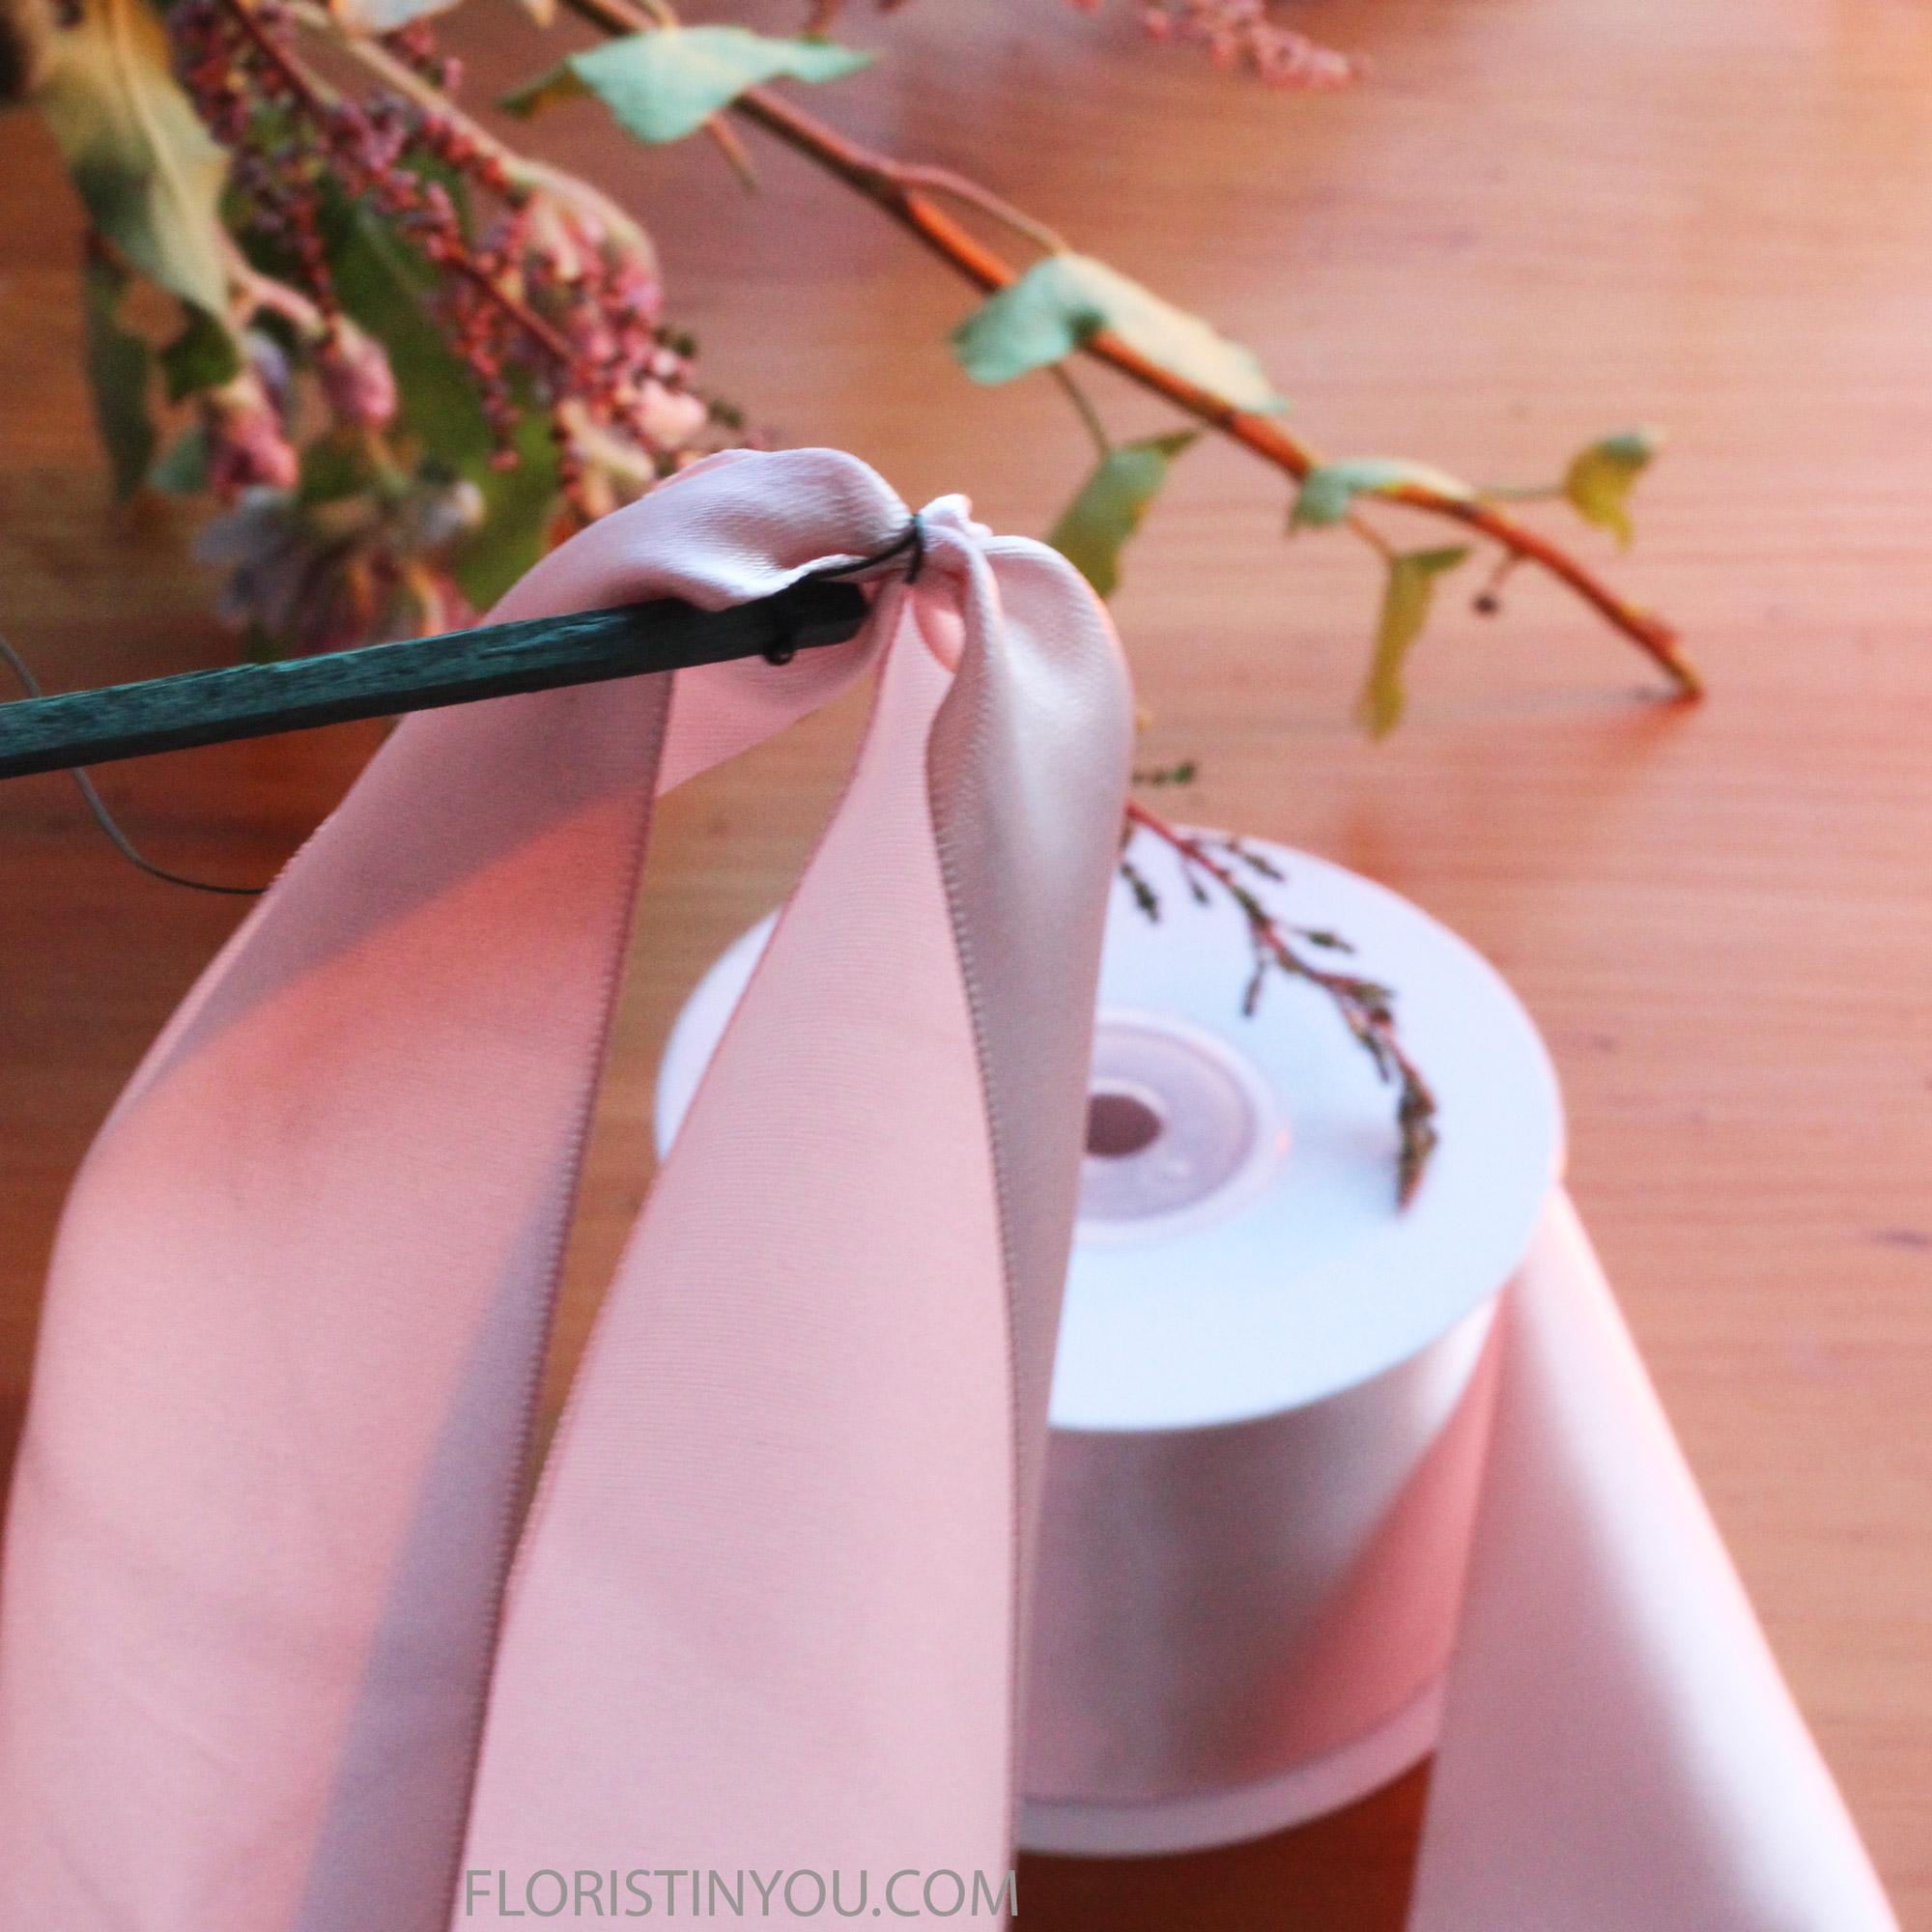 Wrap pick wire around ribbon at half way point.